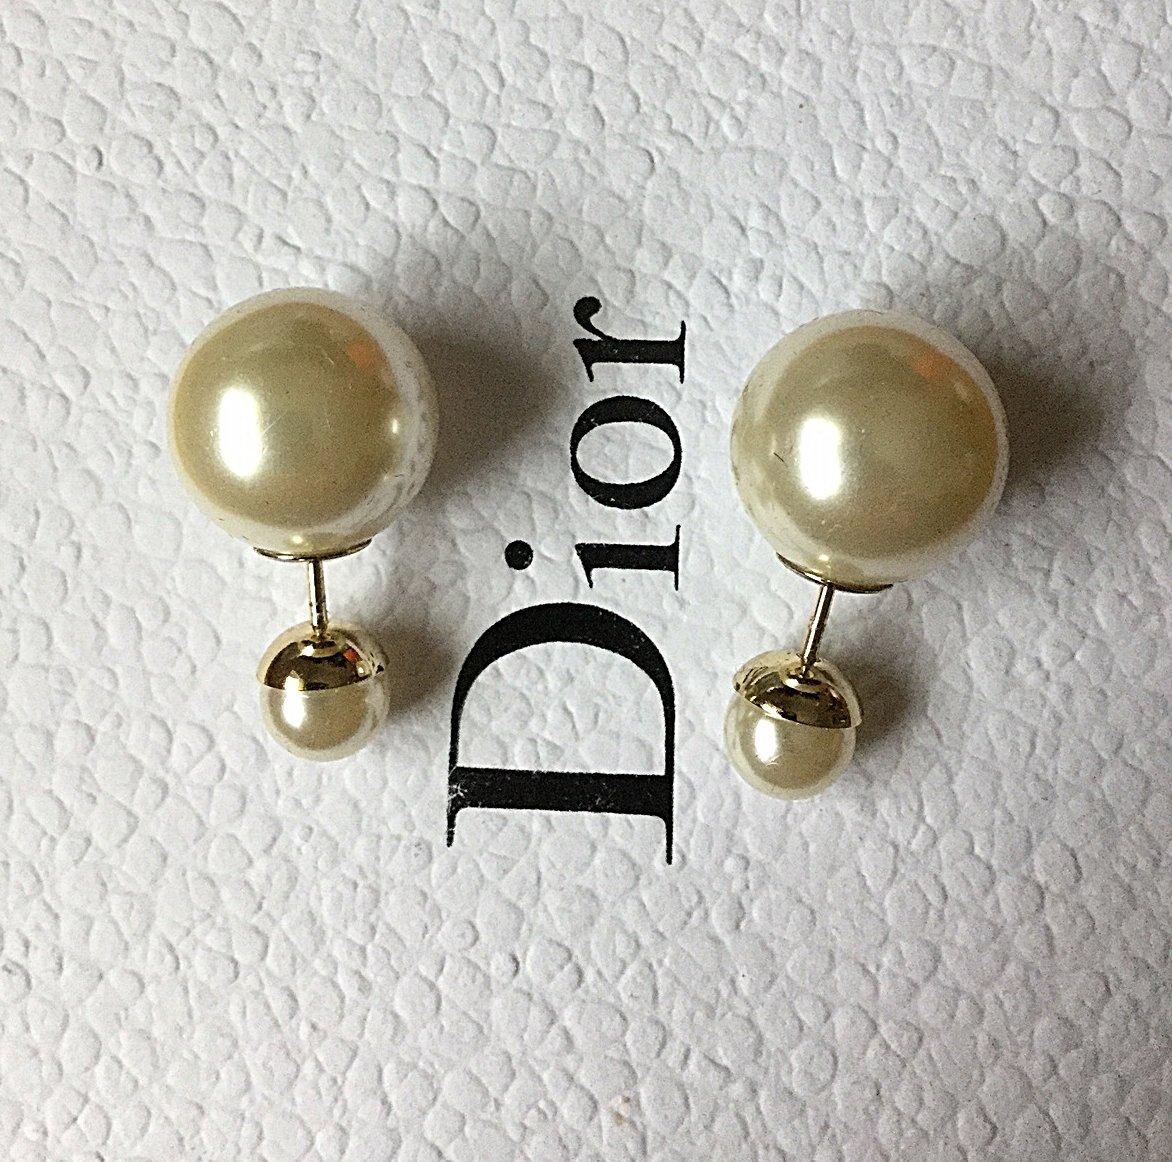 DIOR TRIBALE Mise en Dior Tribal Earrings ORIGINAL Classic